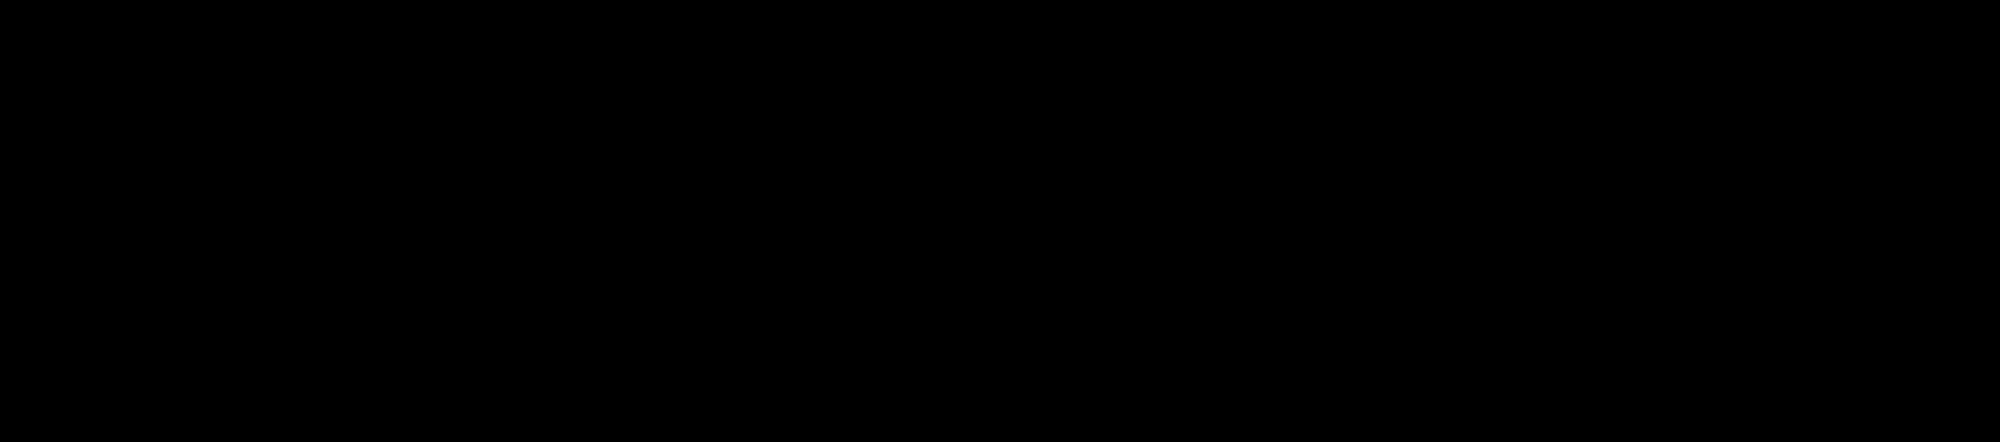 gnosis-logo-black